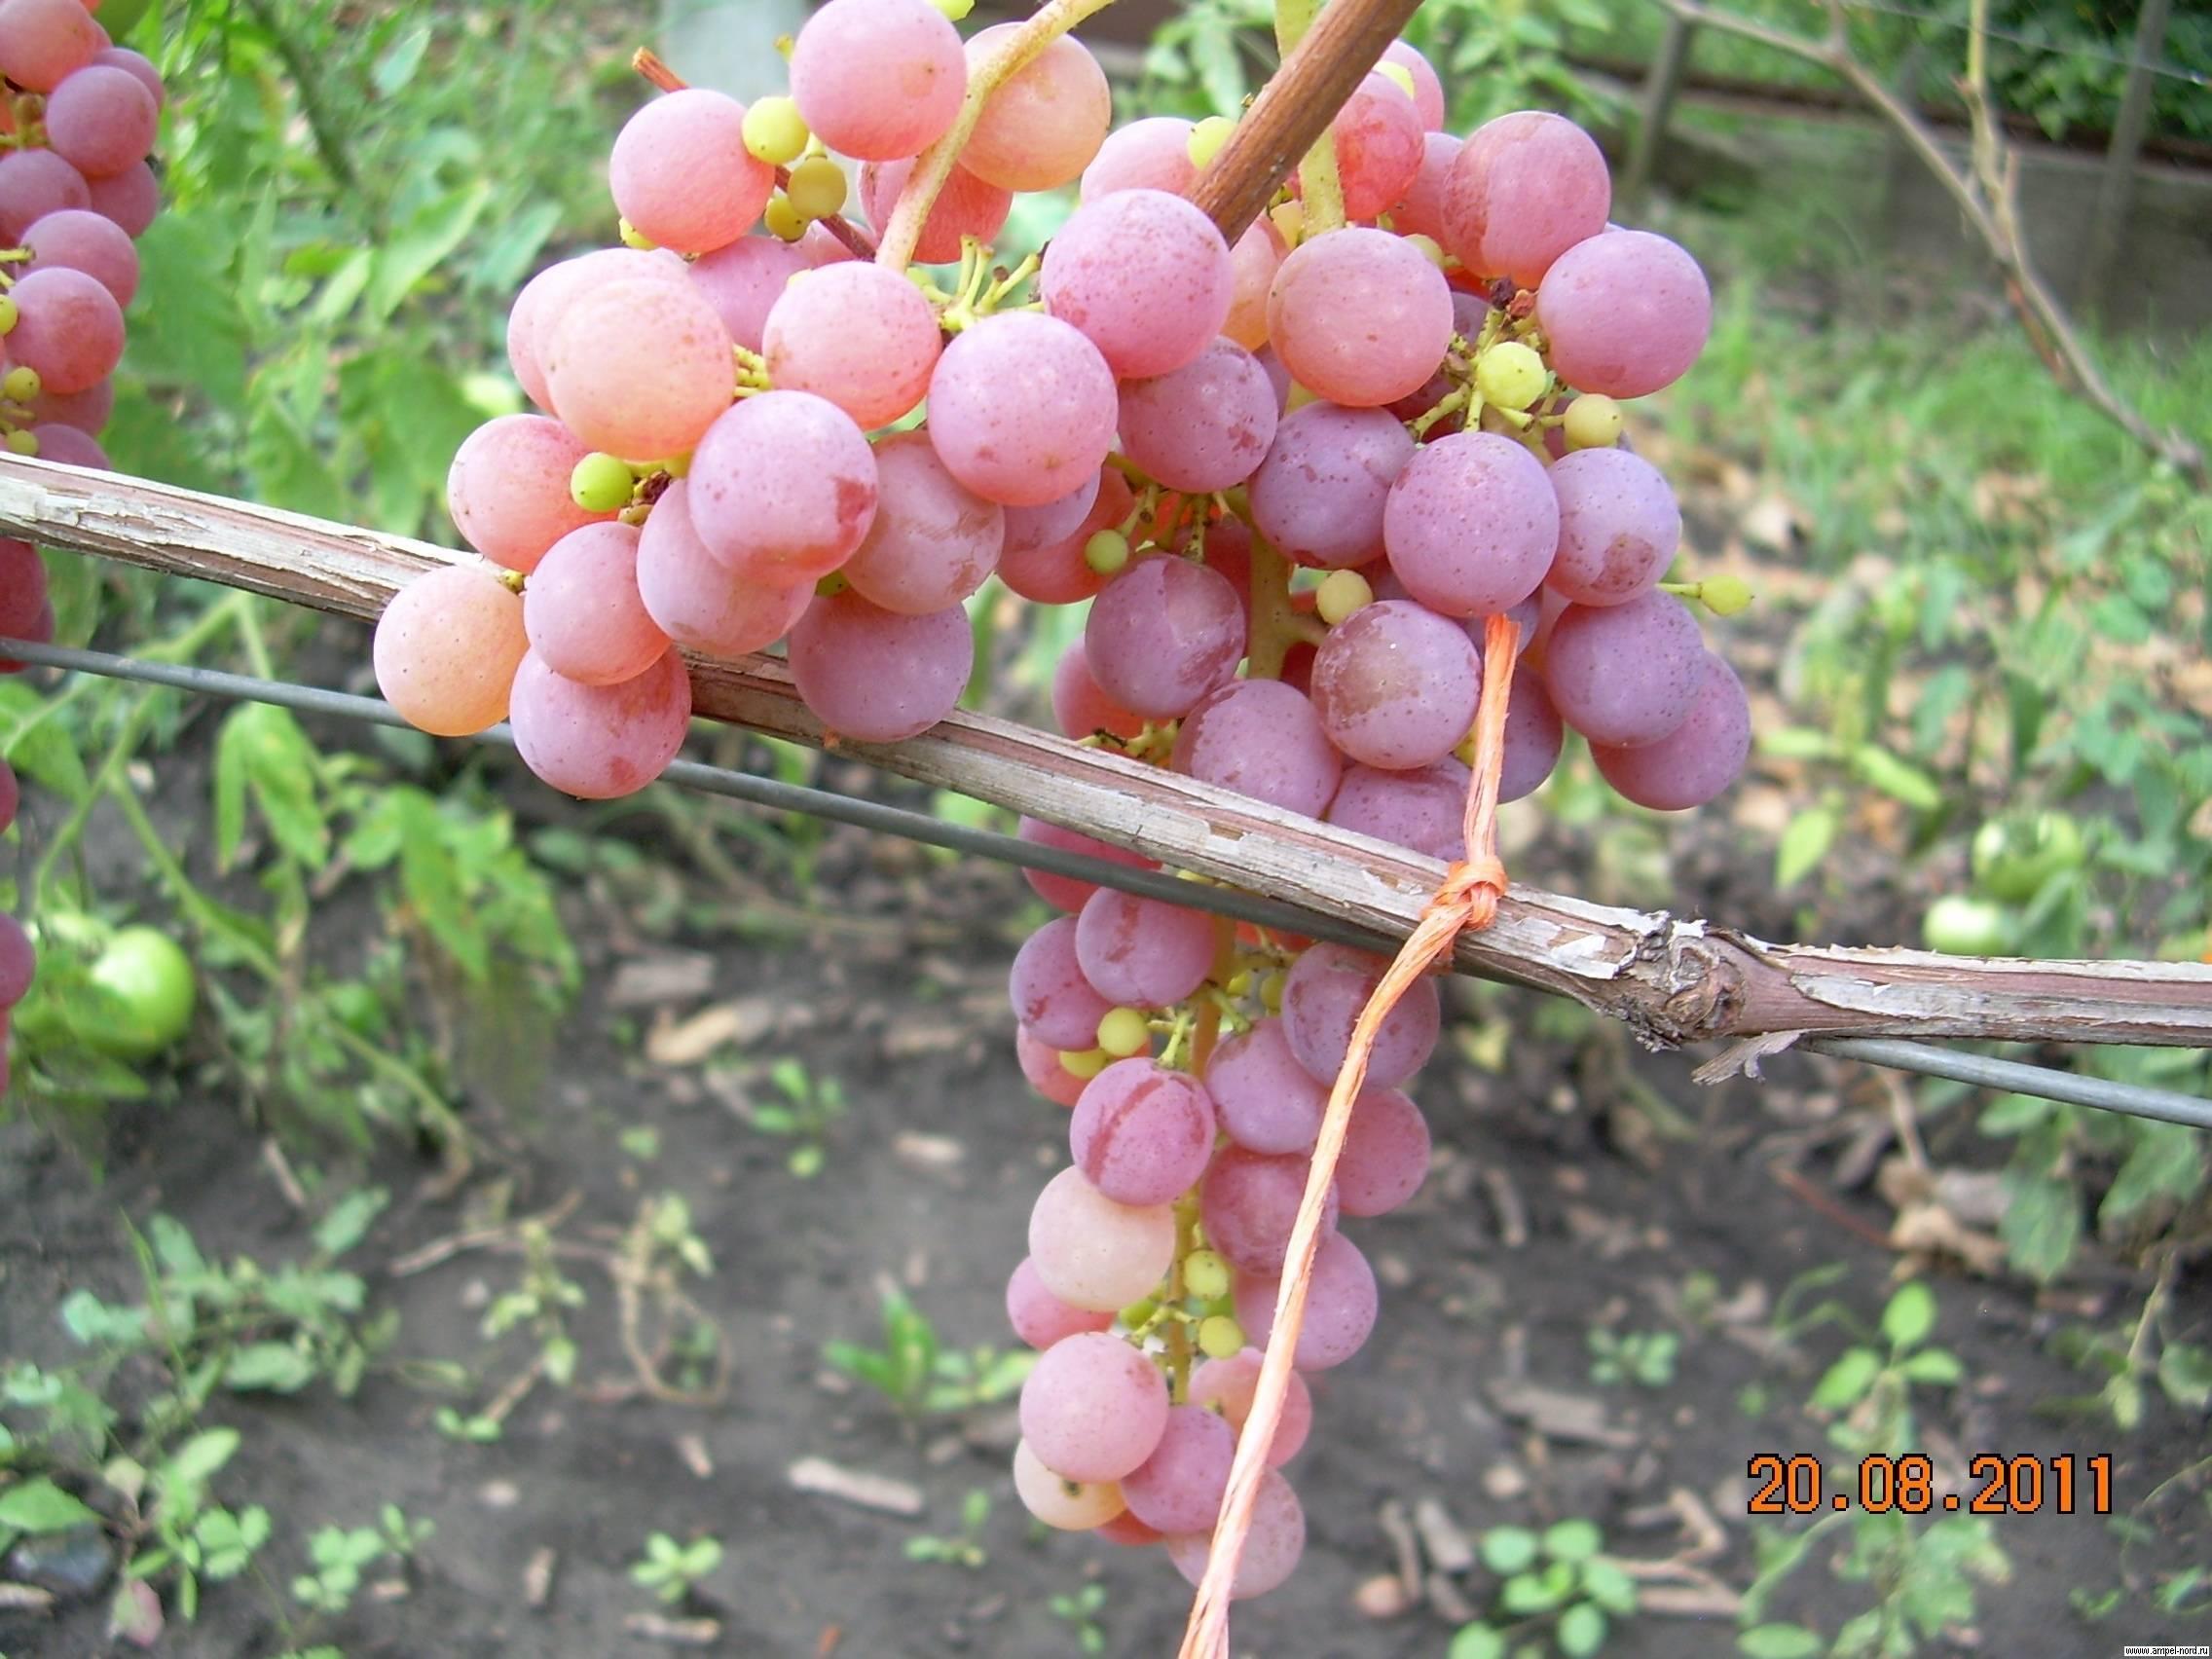 Виноград кишмиш рилайнс пинк сидлис: описание, фото и отзывы